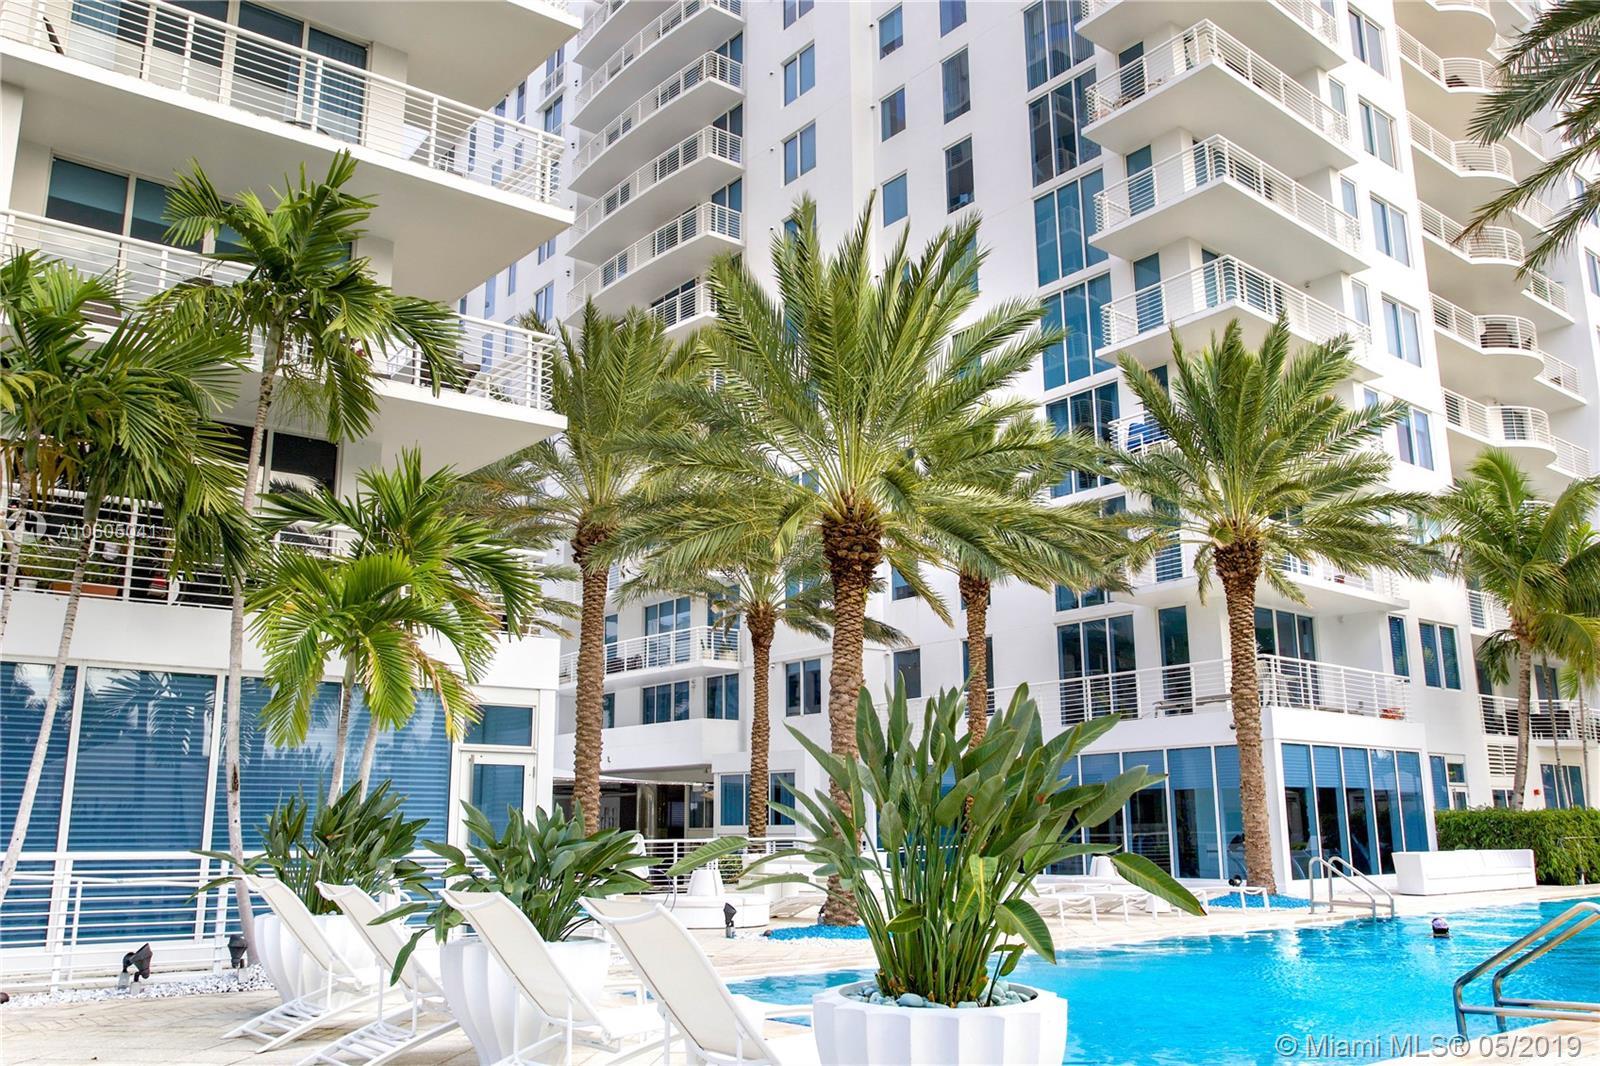 2821 N Ocean Blvd, Unit #405 S Luxury Real Estate